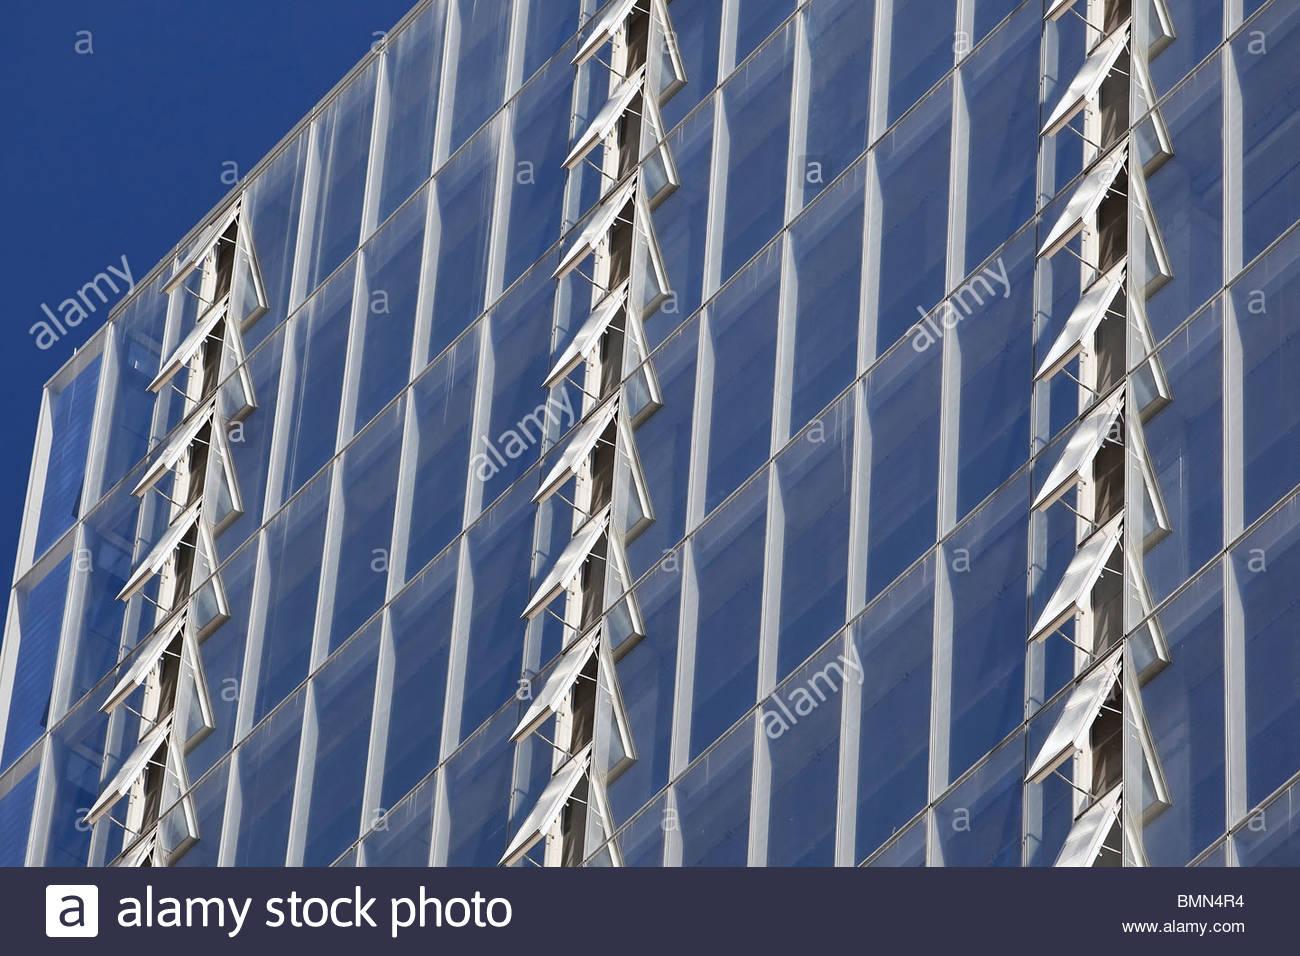 Rows of open windows on Manitoba Hydro Building, Winnipeg, Manitoba, Canada - Stock Image